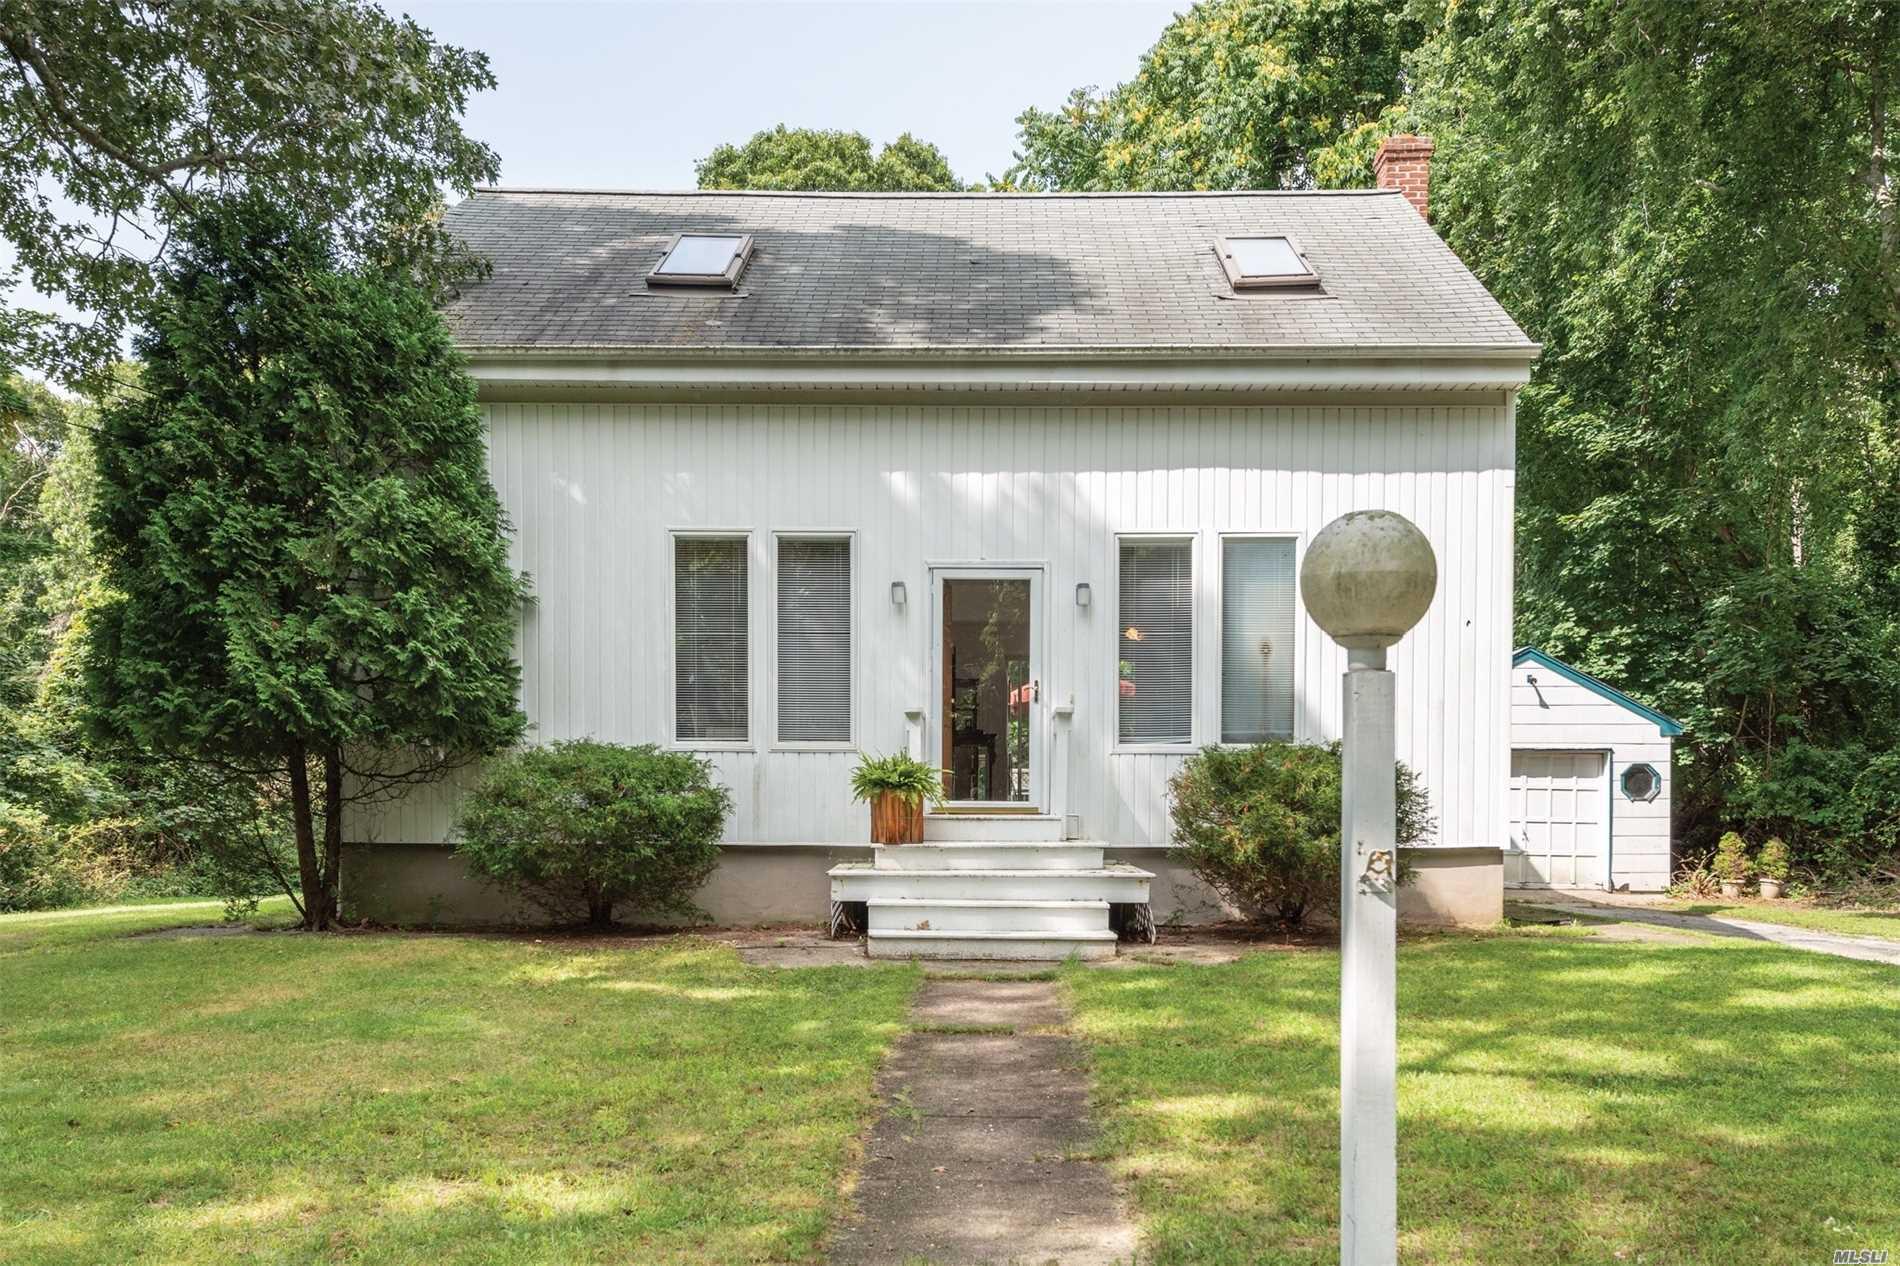 Photo of home for sale at 6 Arbutus Ln, Hampton Bays NY